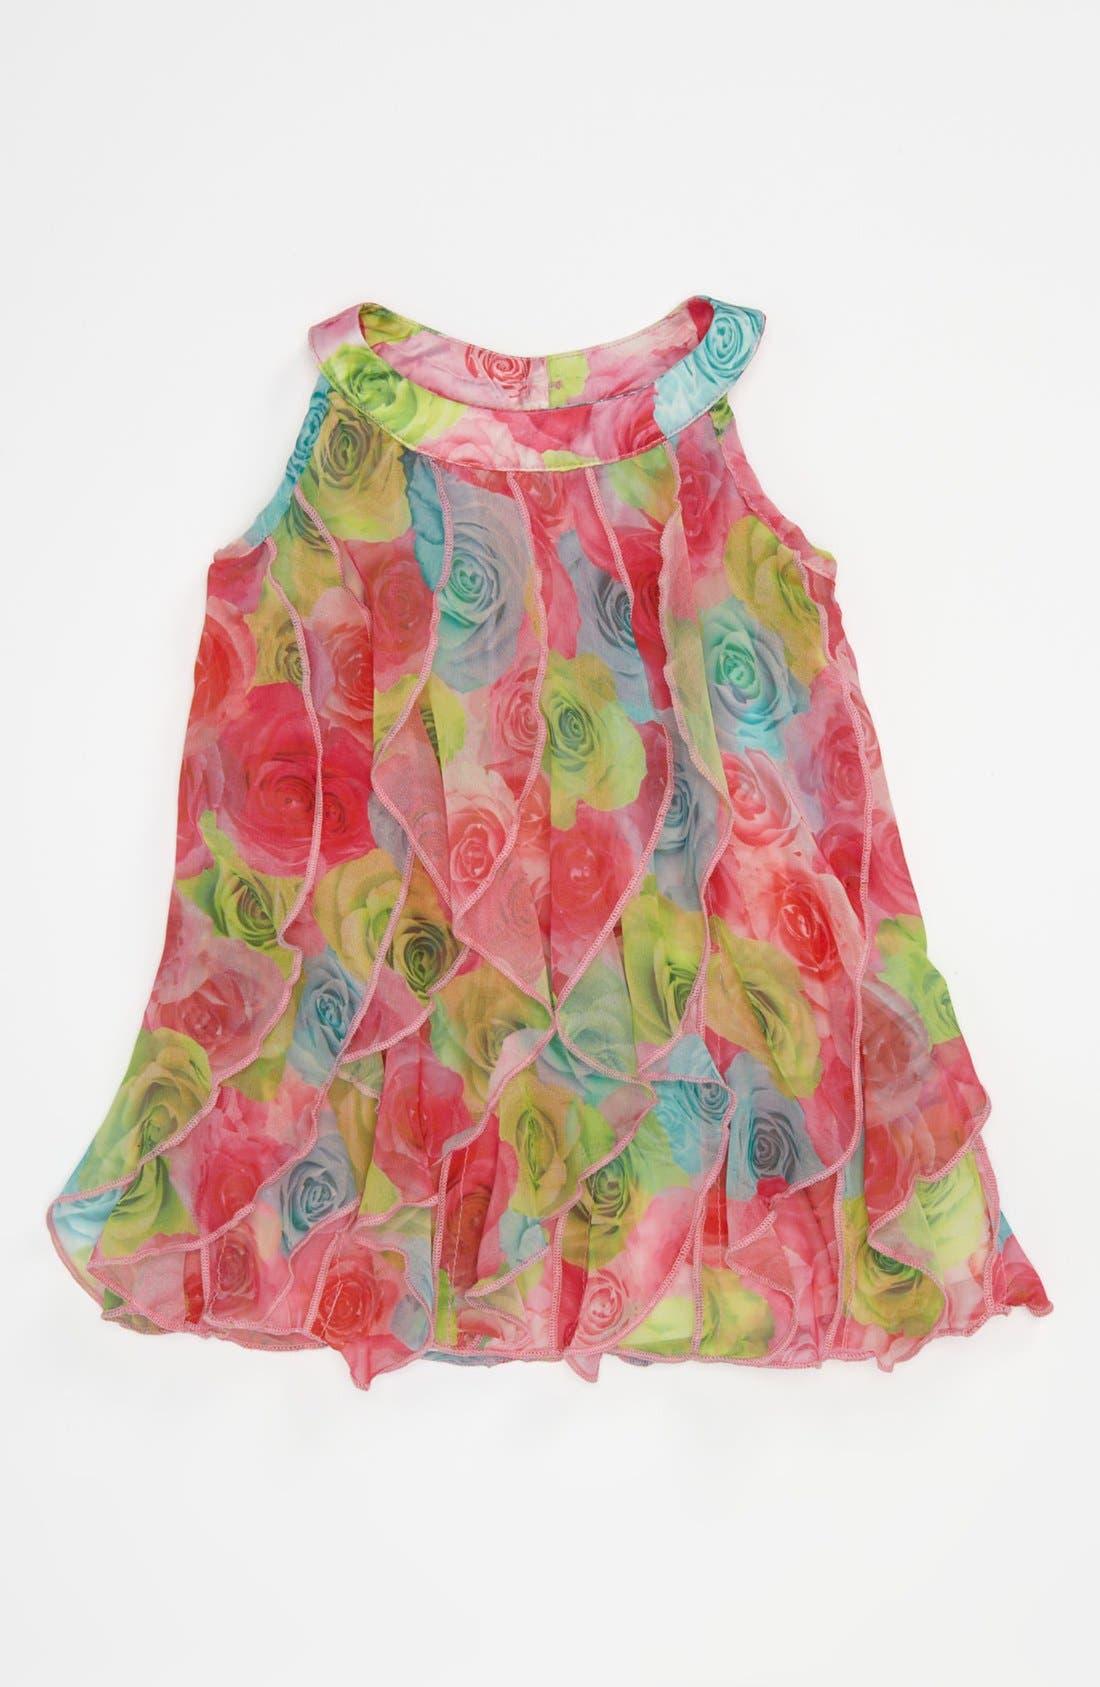 Alternate Image 1 Selected - Biscotti Ruffle Dress (Baby)